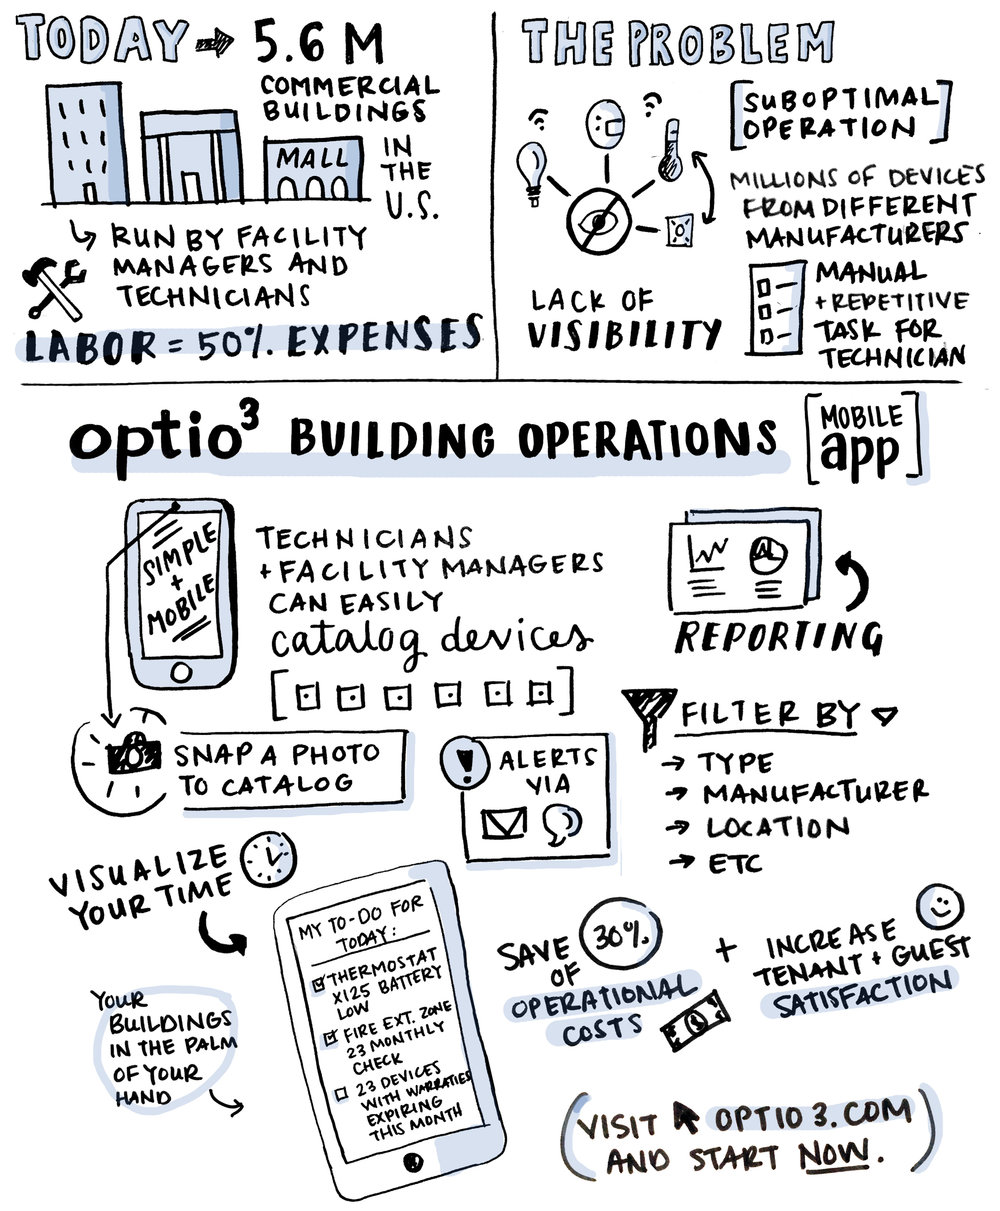 Optio3 App Launch Sketch Graphic